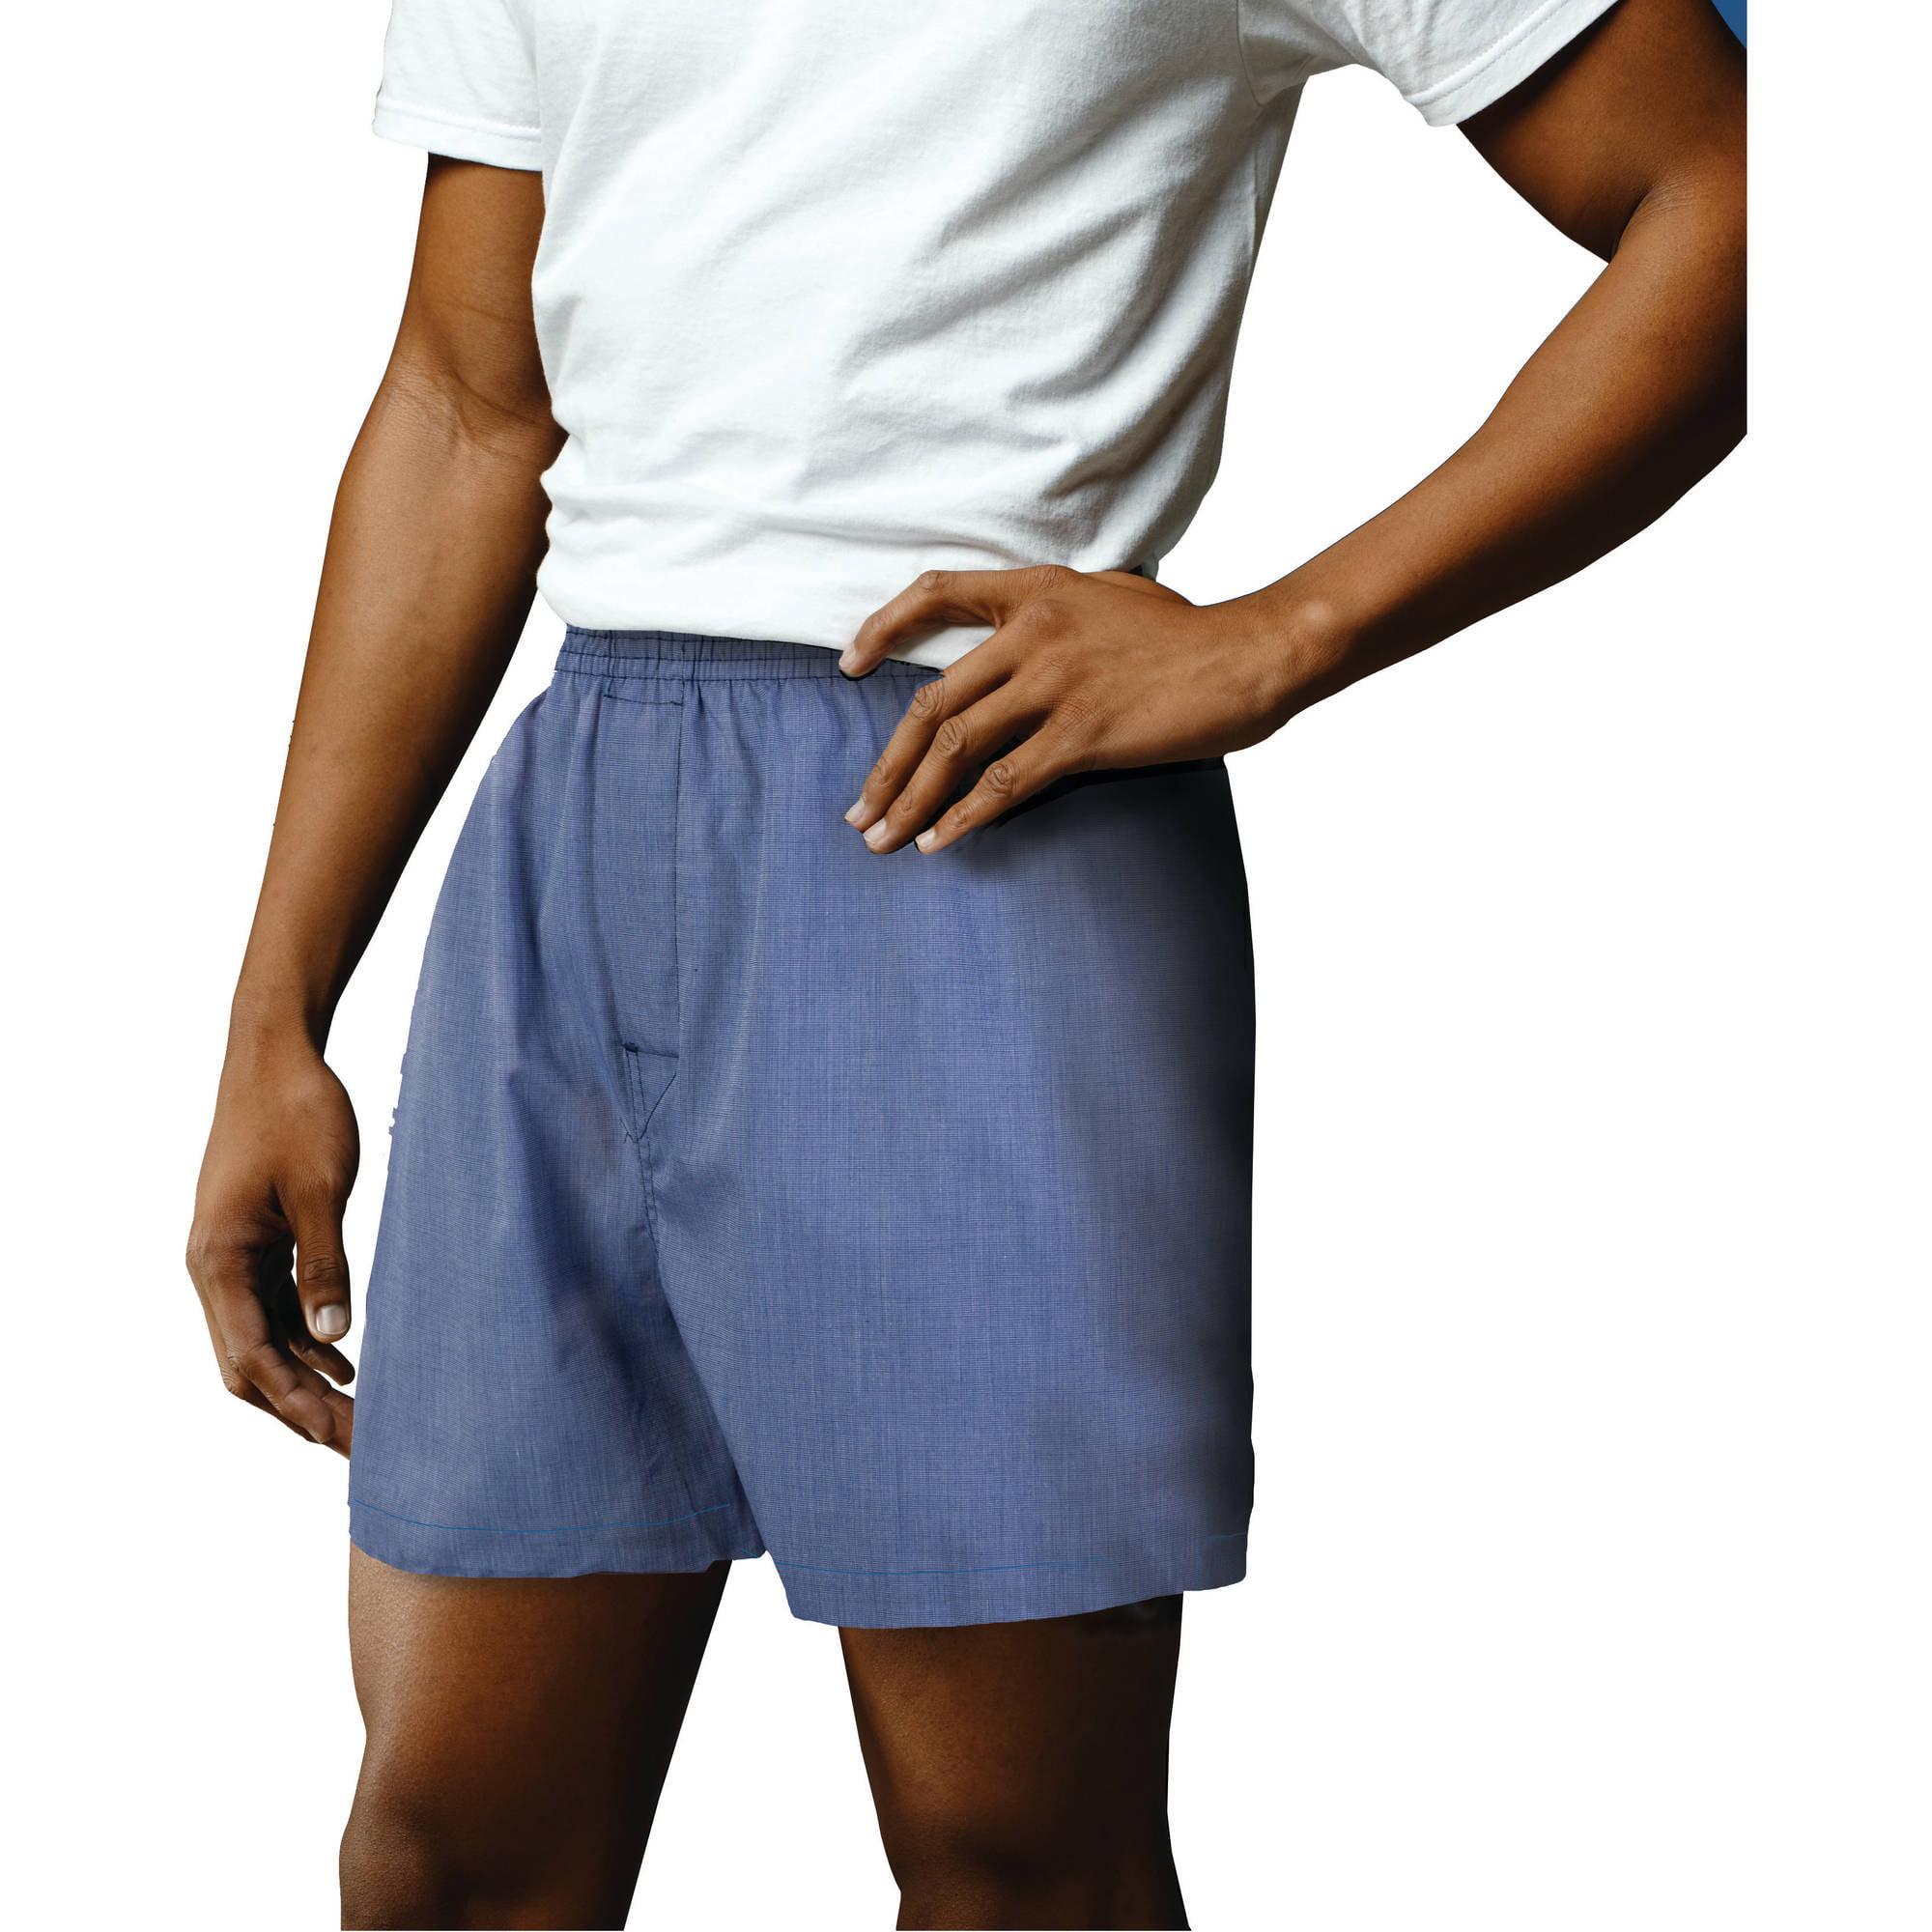 Gildan Big Men's Blue Assorted Woven Boxer Underwear, 2-Pack by